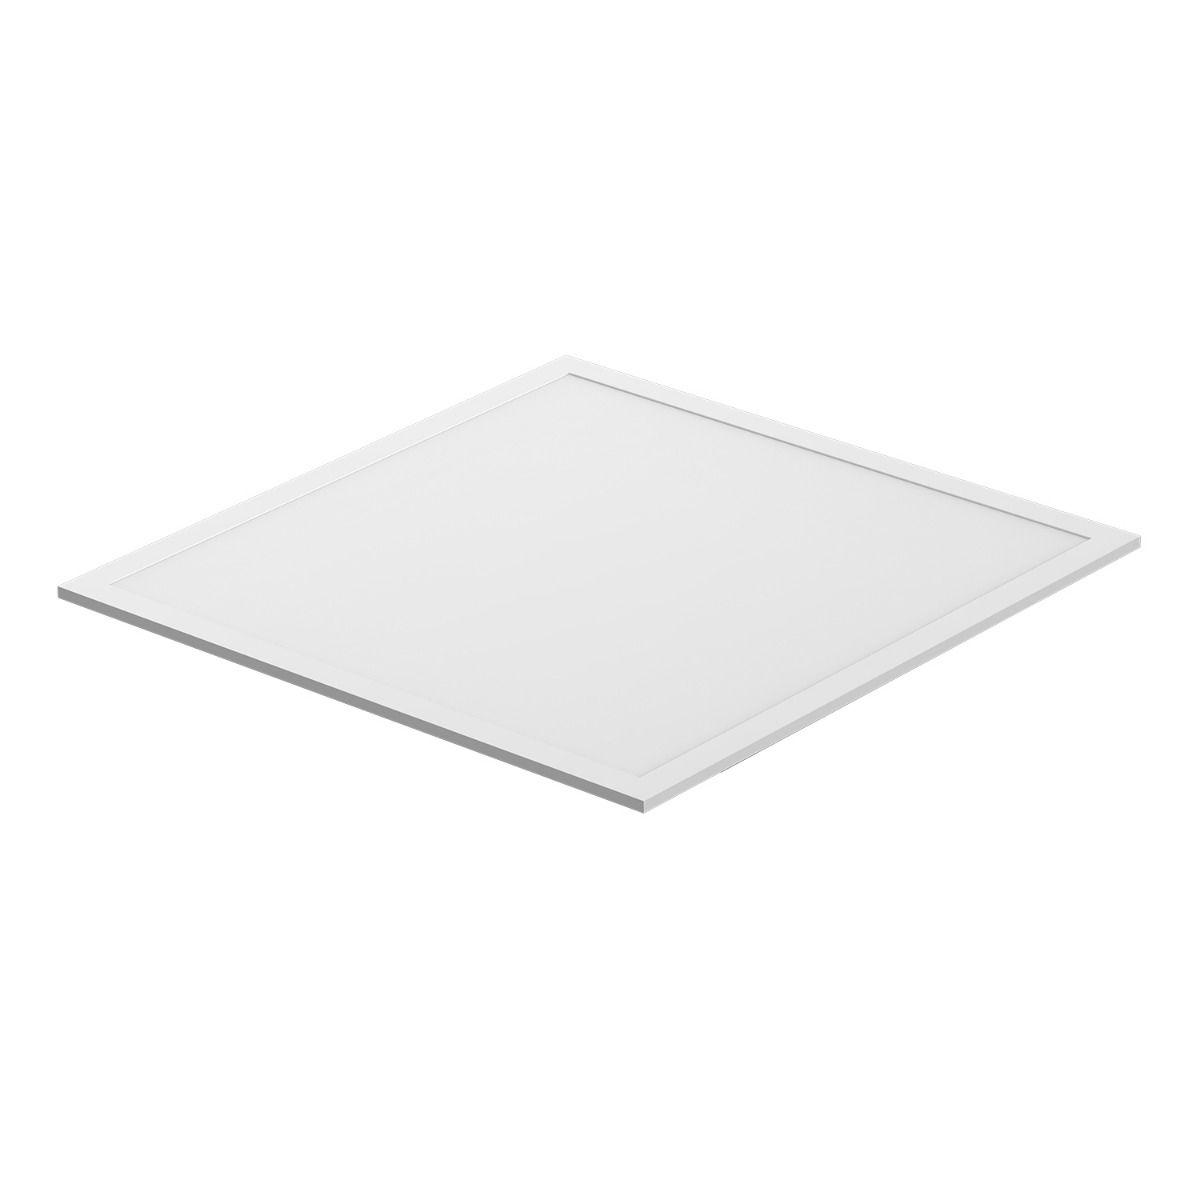 Noxion LED Panel Delta Pro V2.0 Xitanium DALI 30W 60x60cm 6500K 4110lm UGR <19 | Dali Dimmable - Daylight - Replaces 4x18W